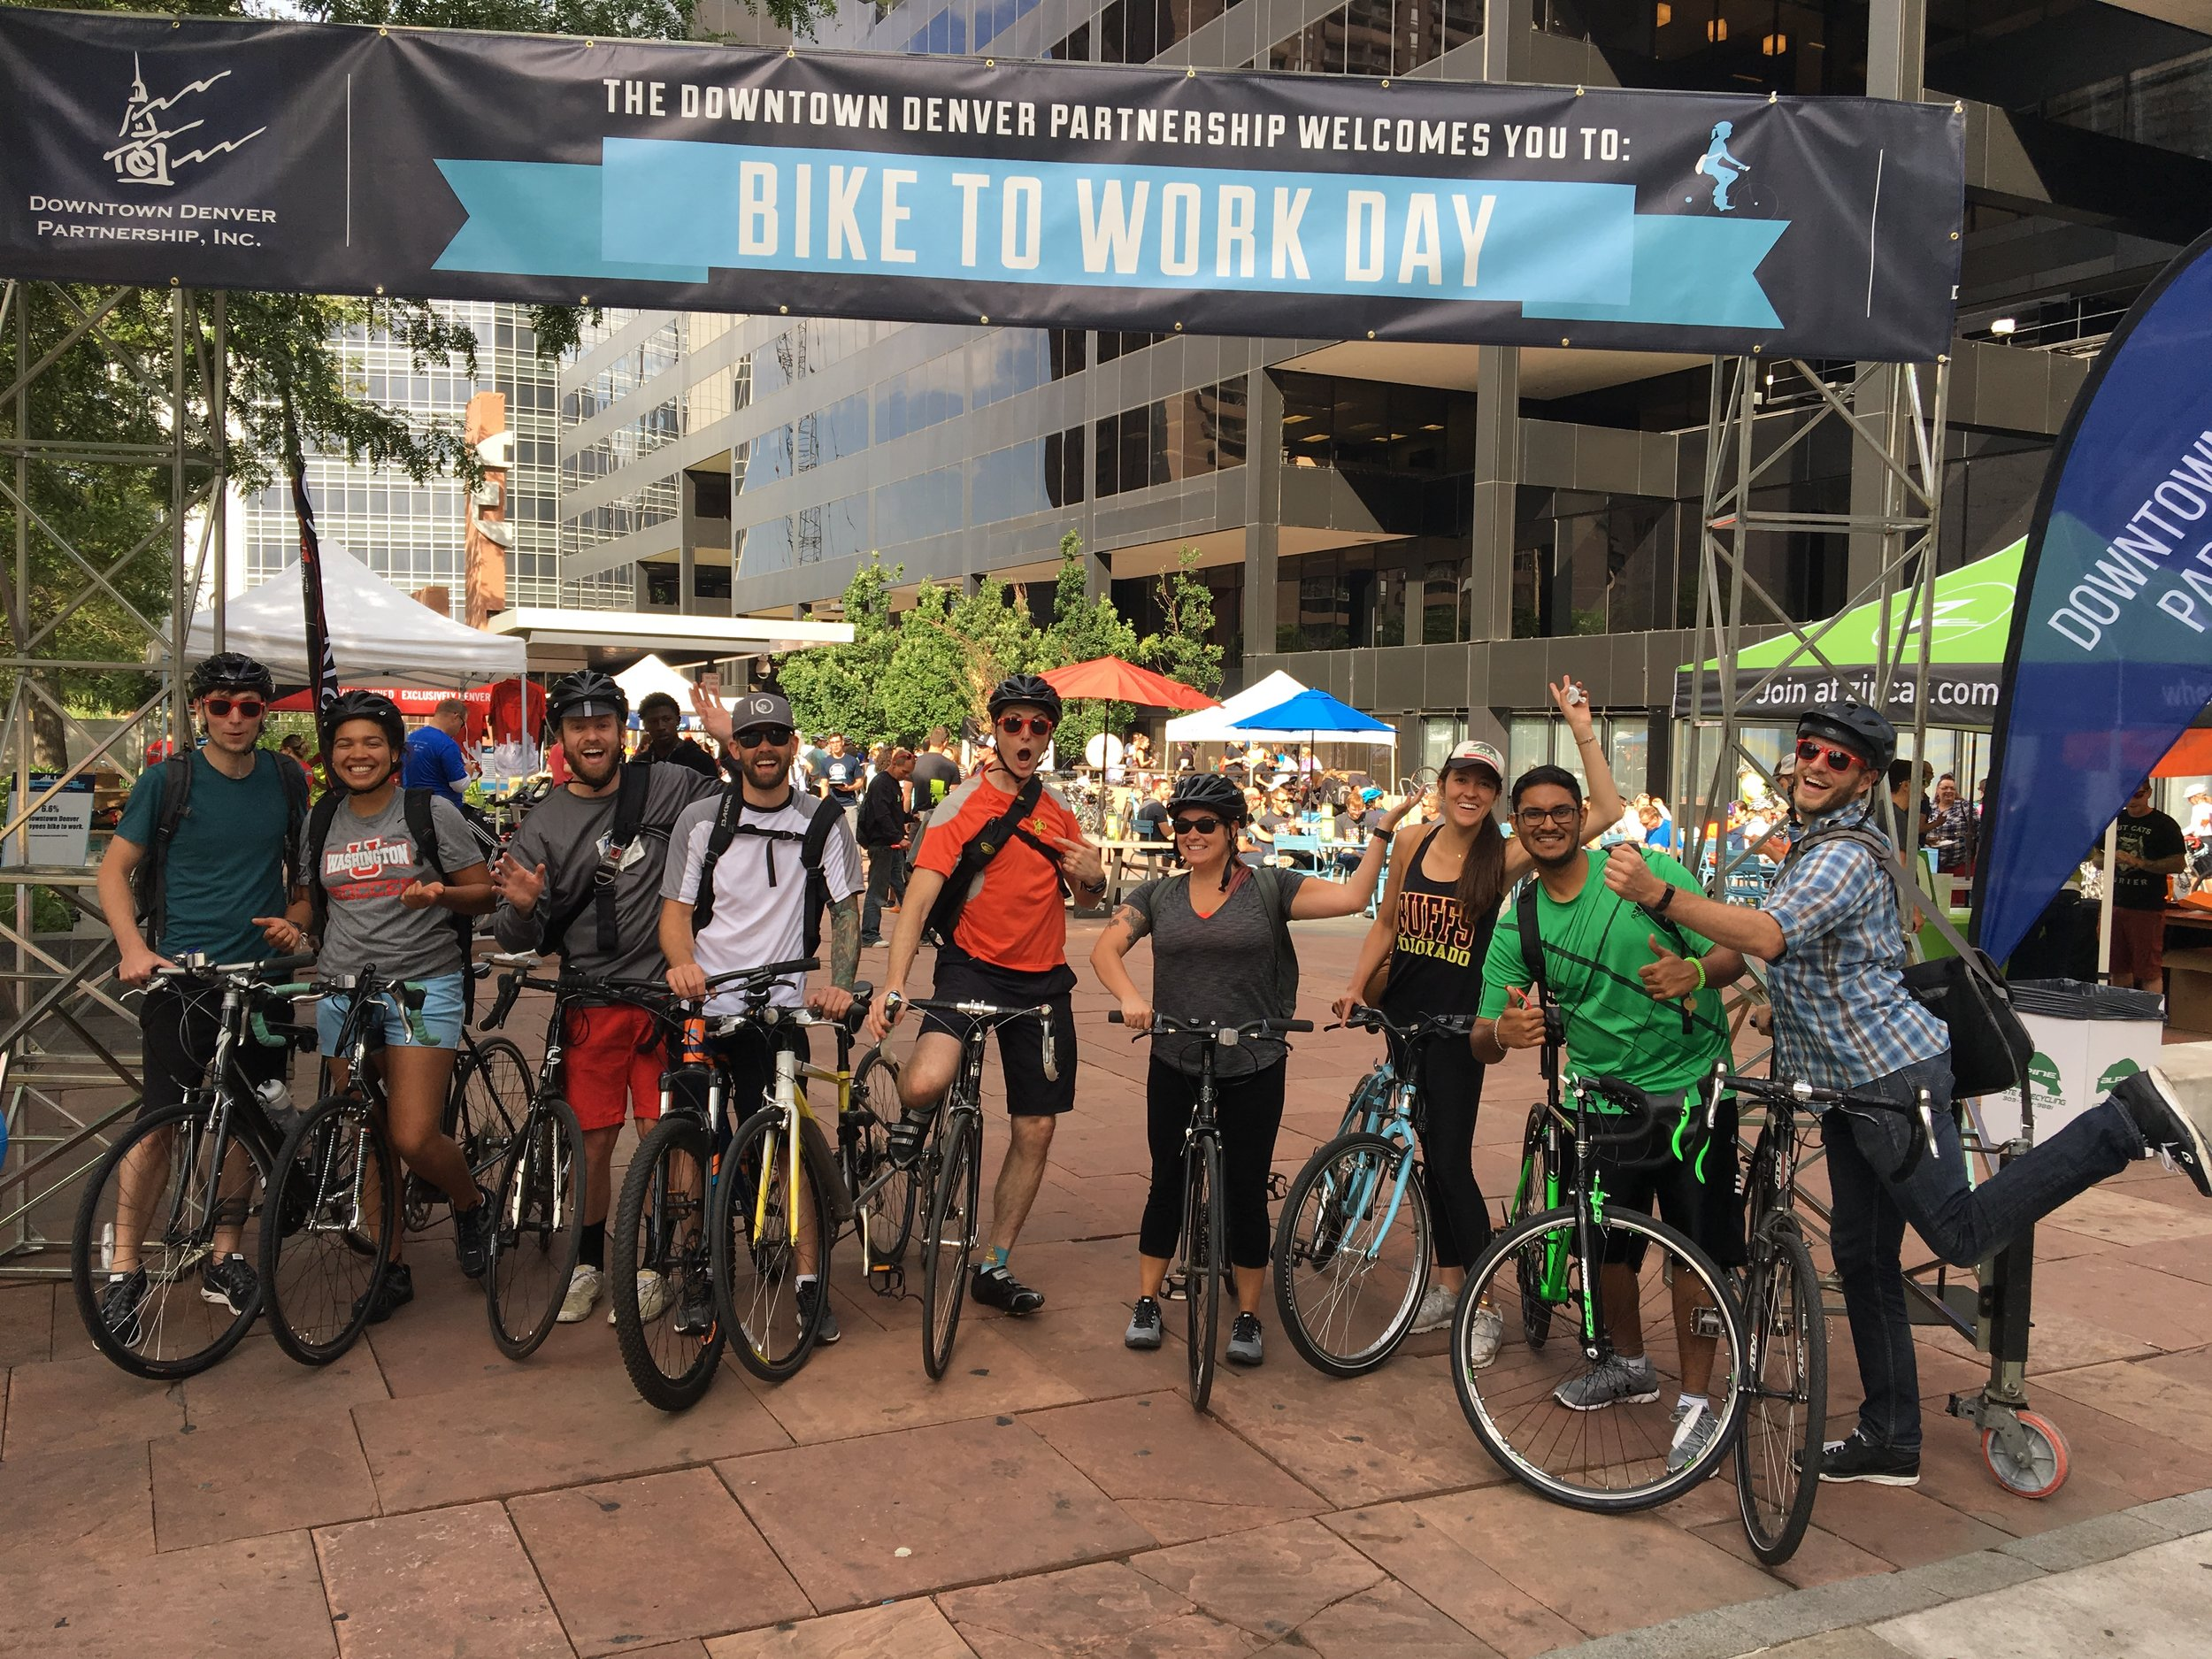 2017 06 28 - Bike to Work Day  (10).JPG